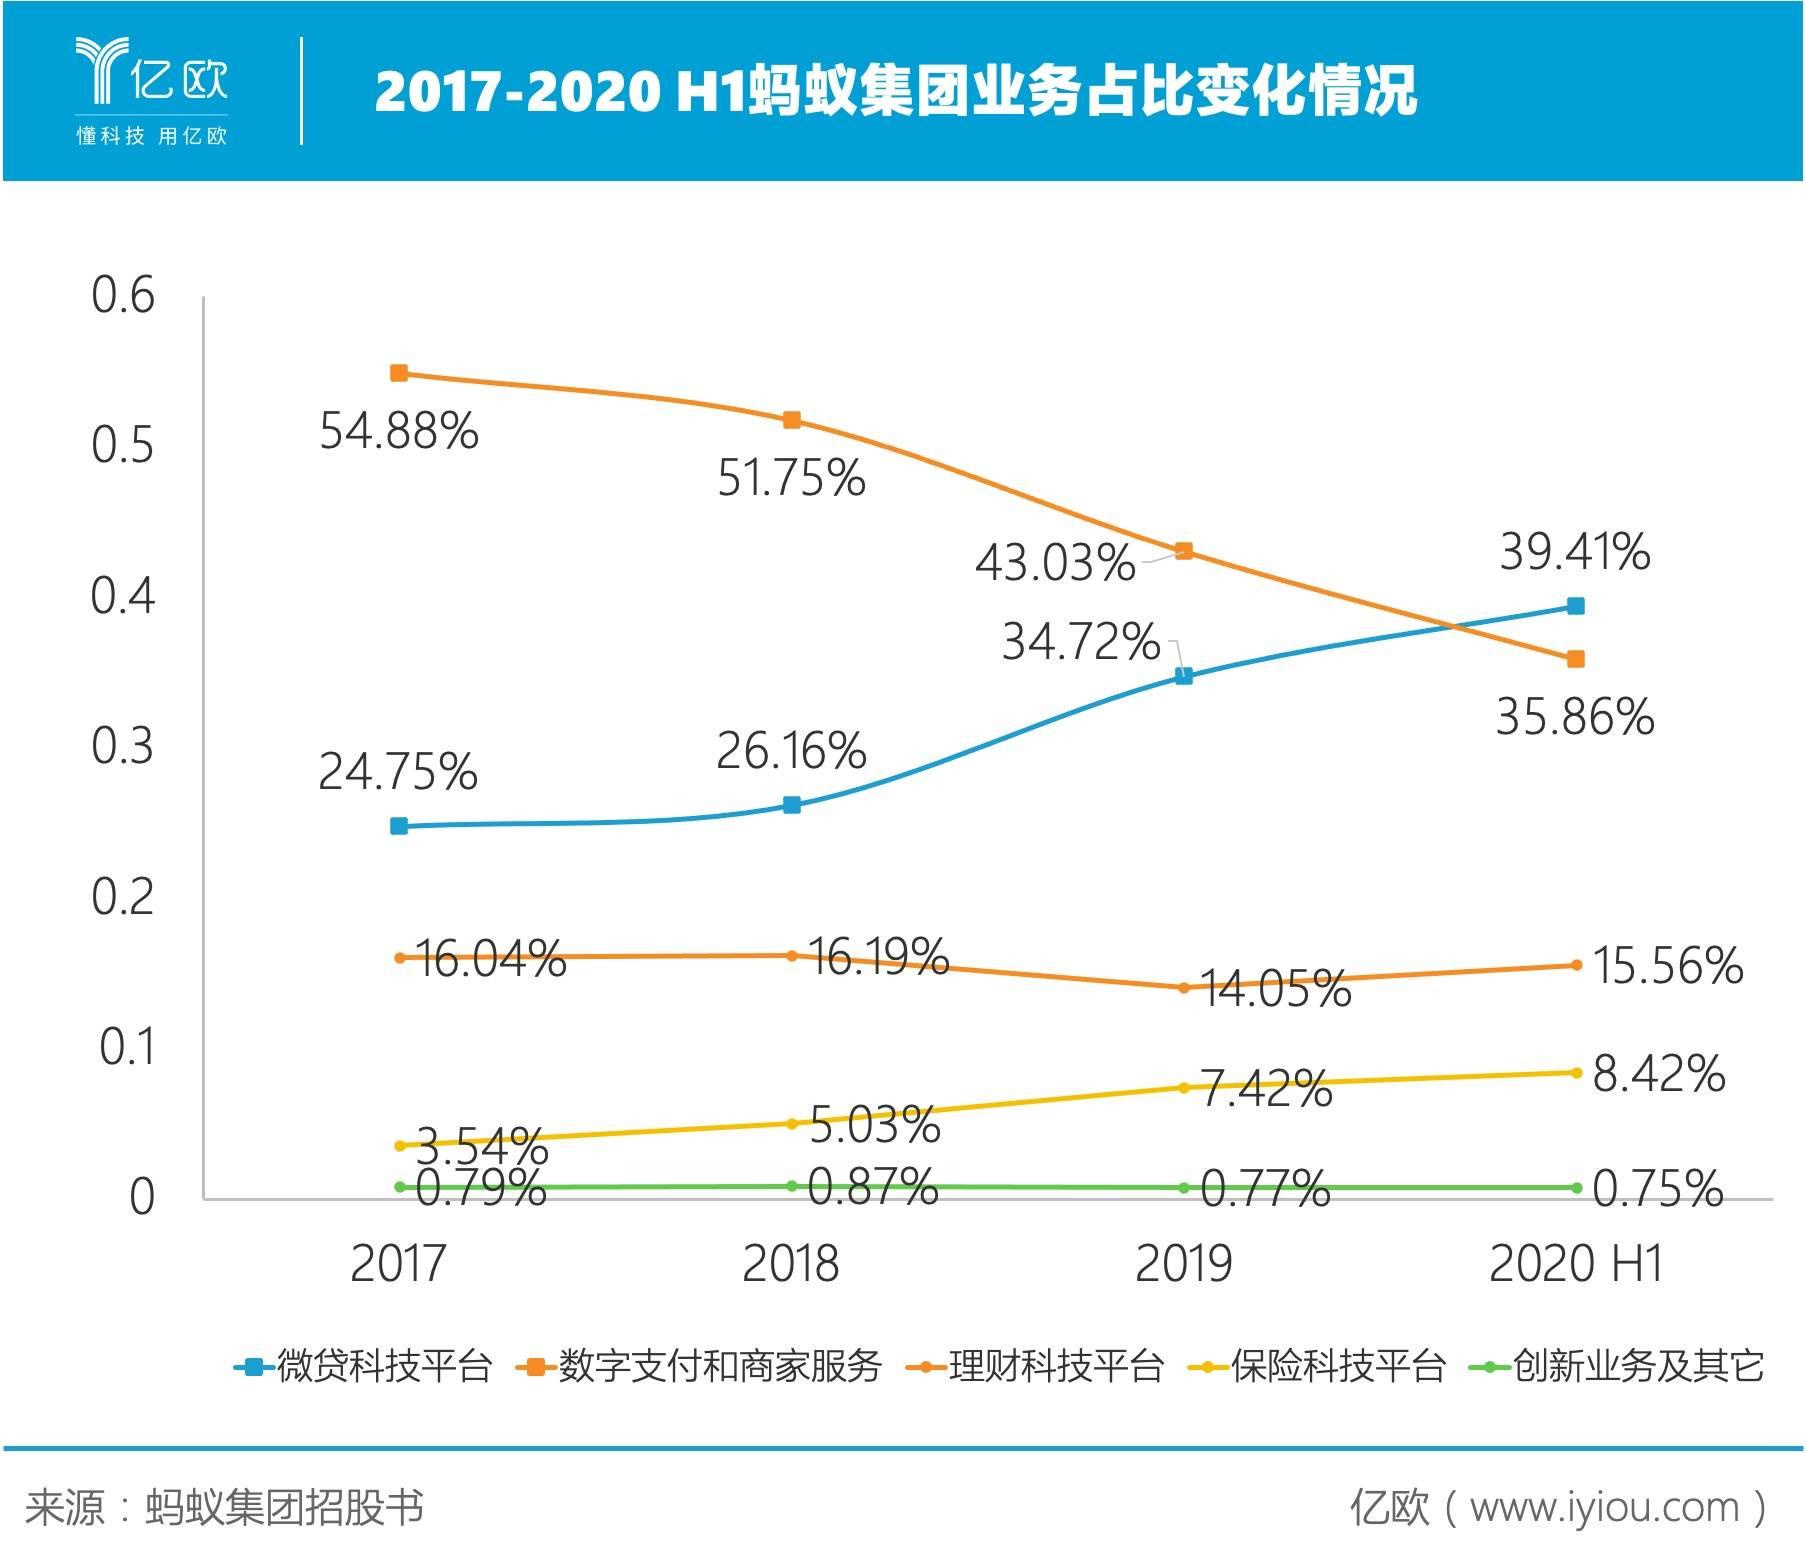 2017-2020 H1蚂蚁集团业务占比变化情况